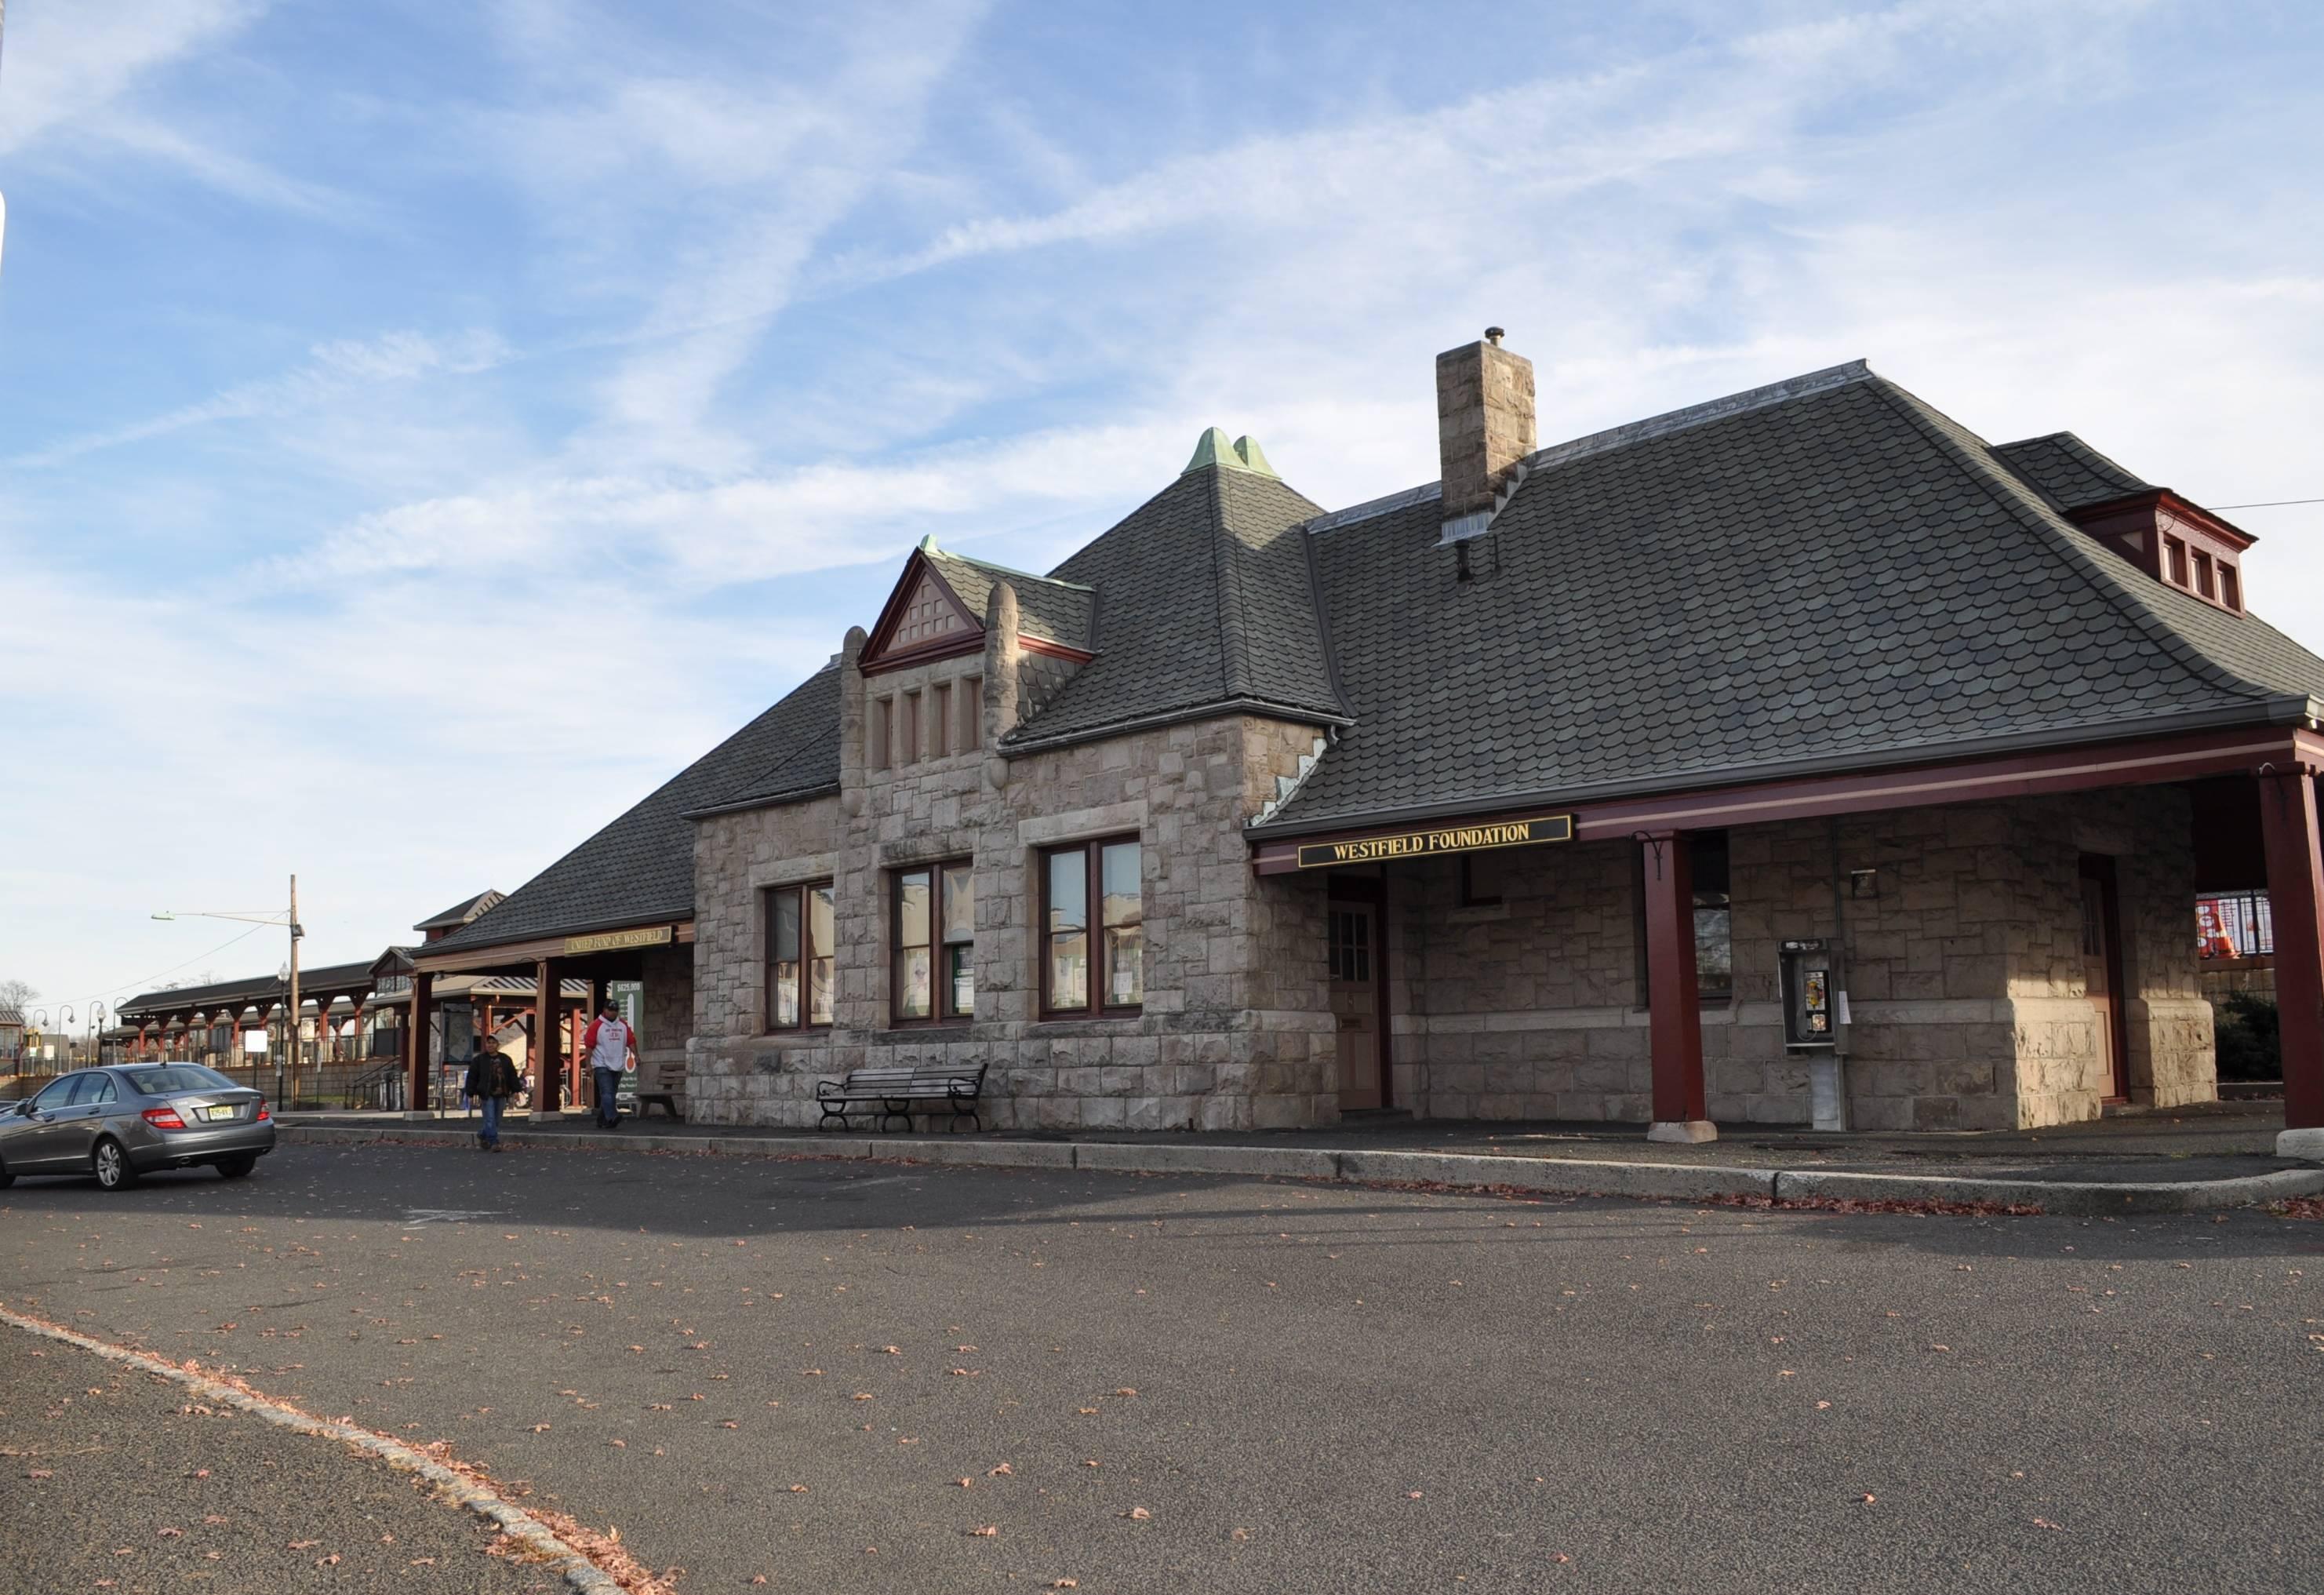 7cef9c5dfcb6e8f57c69_train_station.JPG